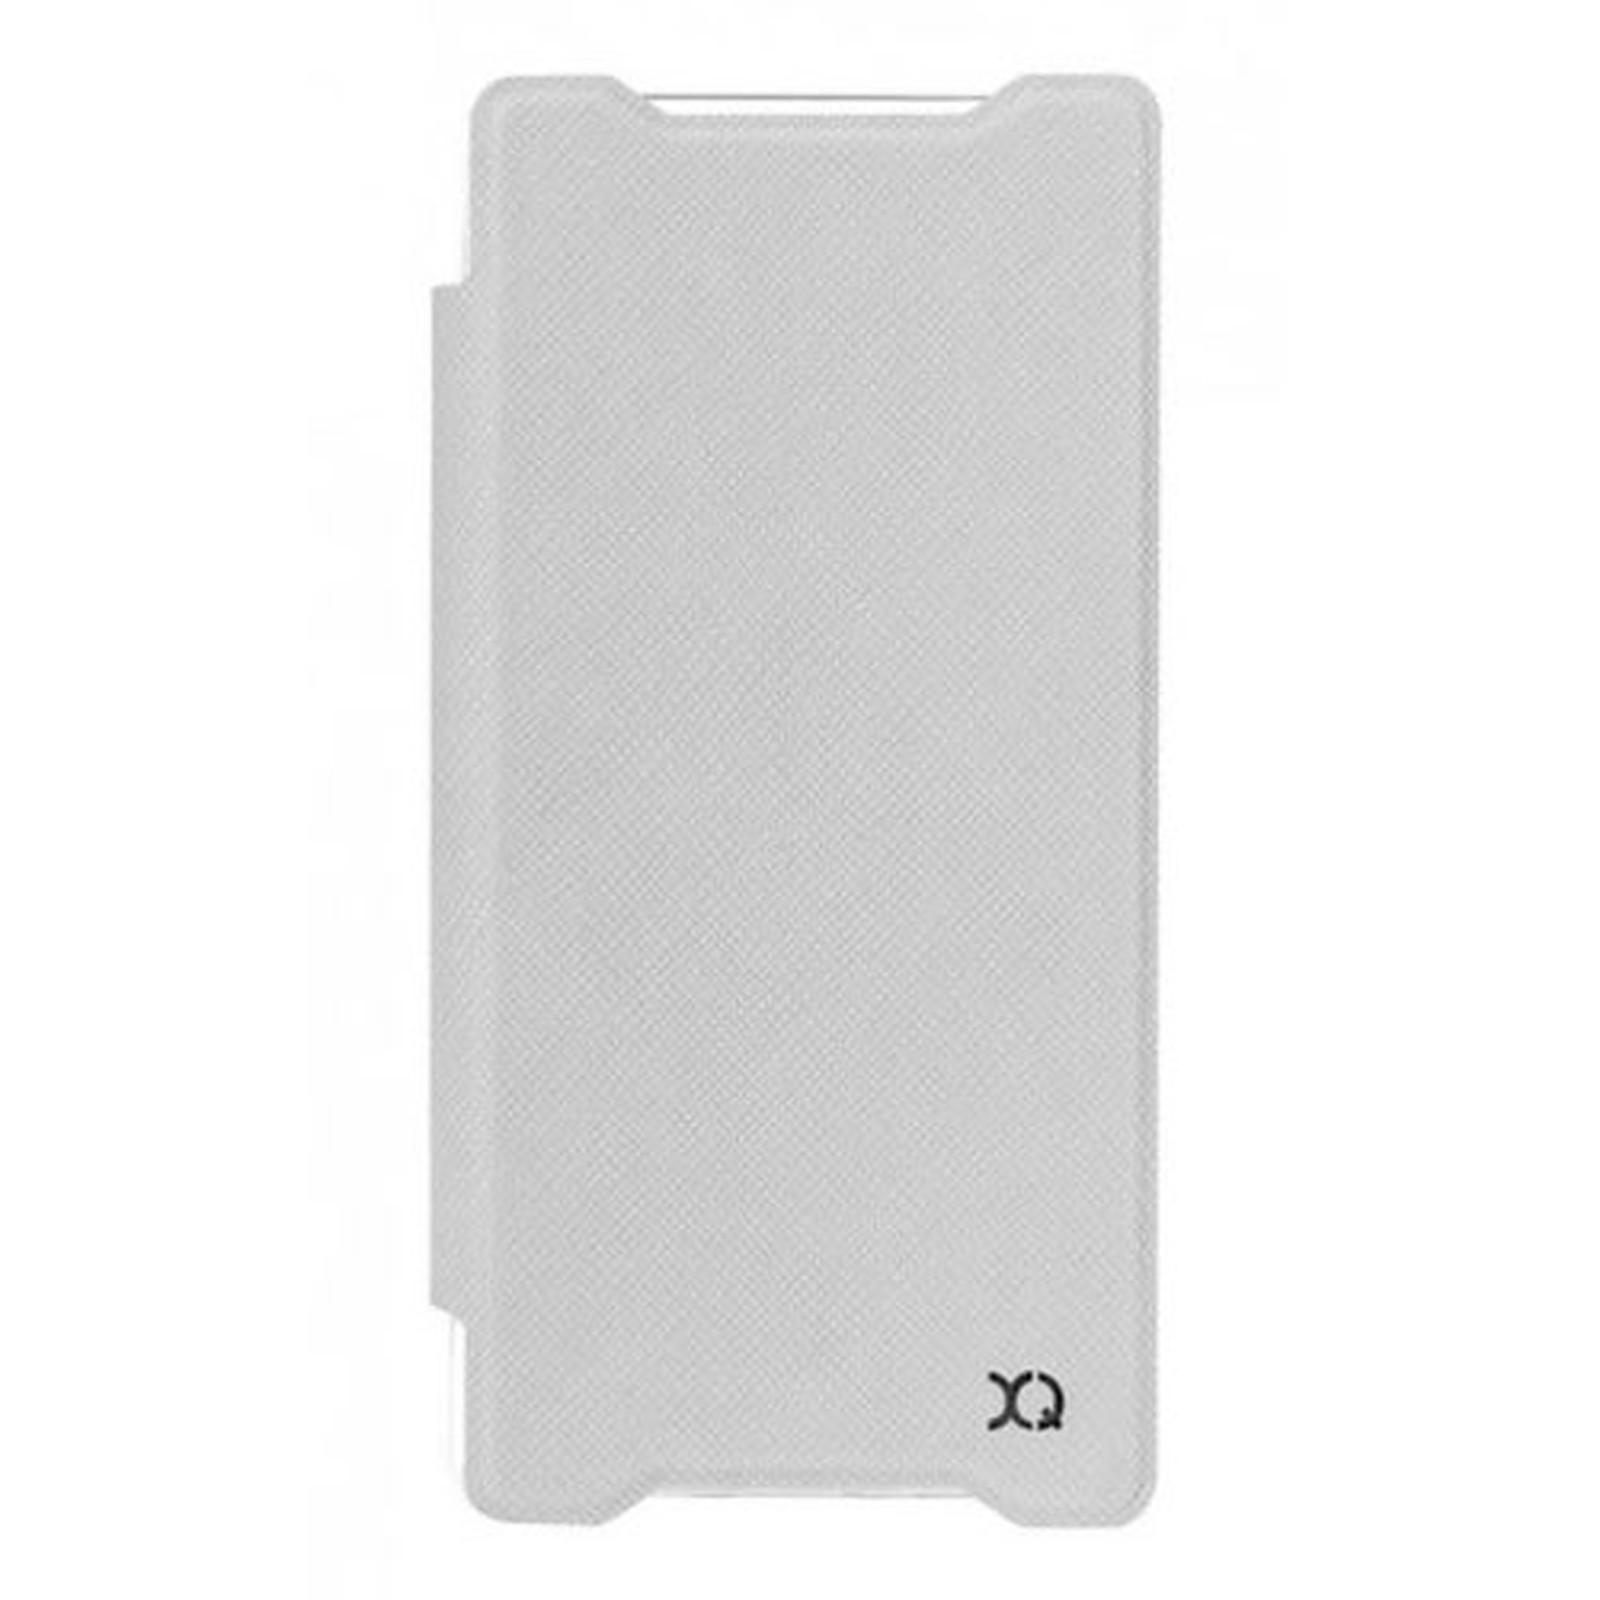 xqisit Etui Flap Cover Adour Blanc Sony Xperia Z5